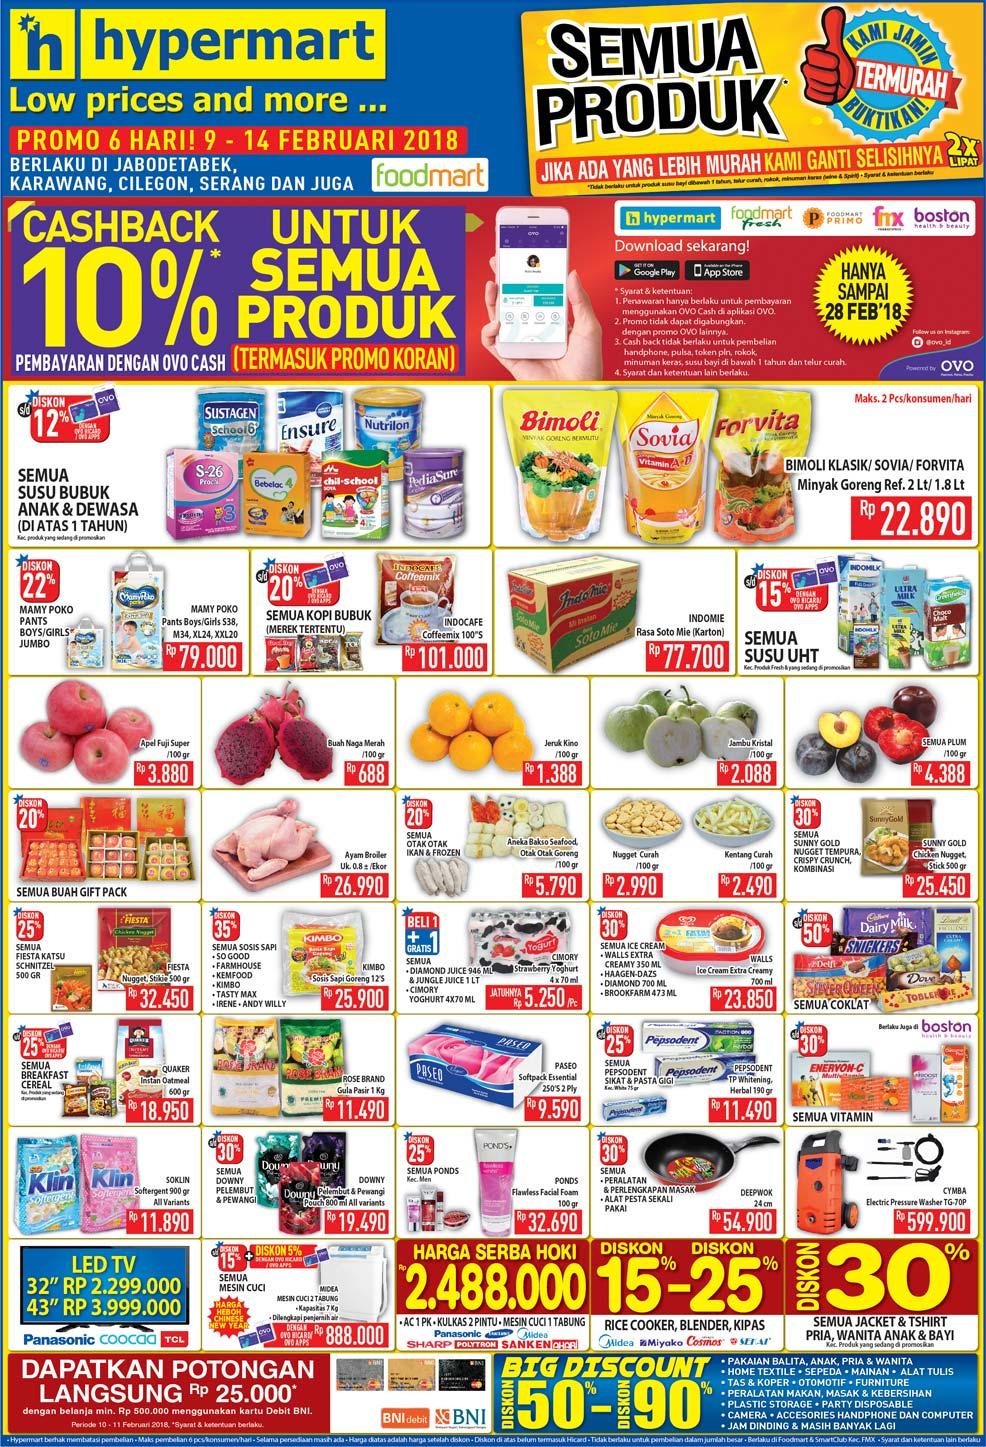 Harga Jual Tv Led Hypermart Software Display Informasi Dan Promosi Voucher Belanja Katalog Promo Jsm Akhir Pekan Periode 09